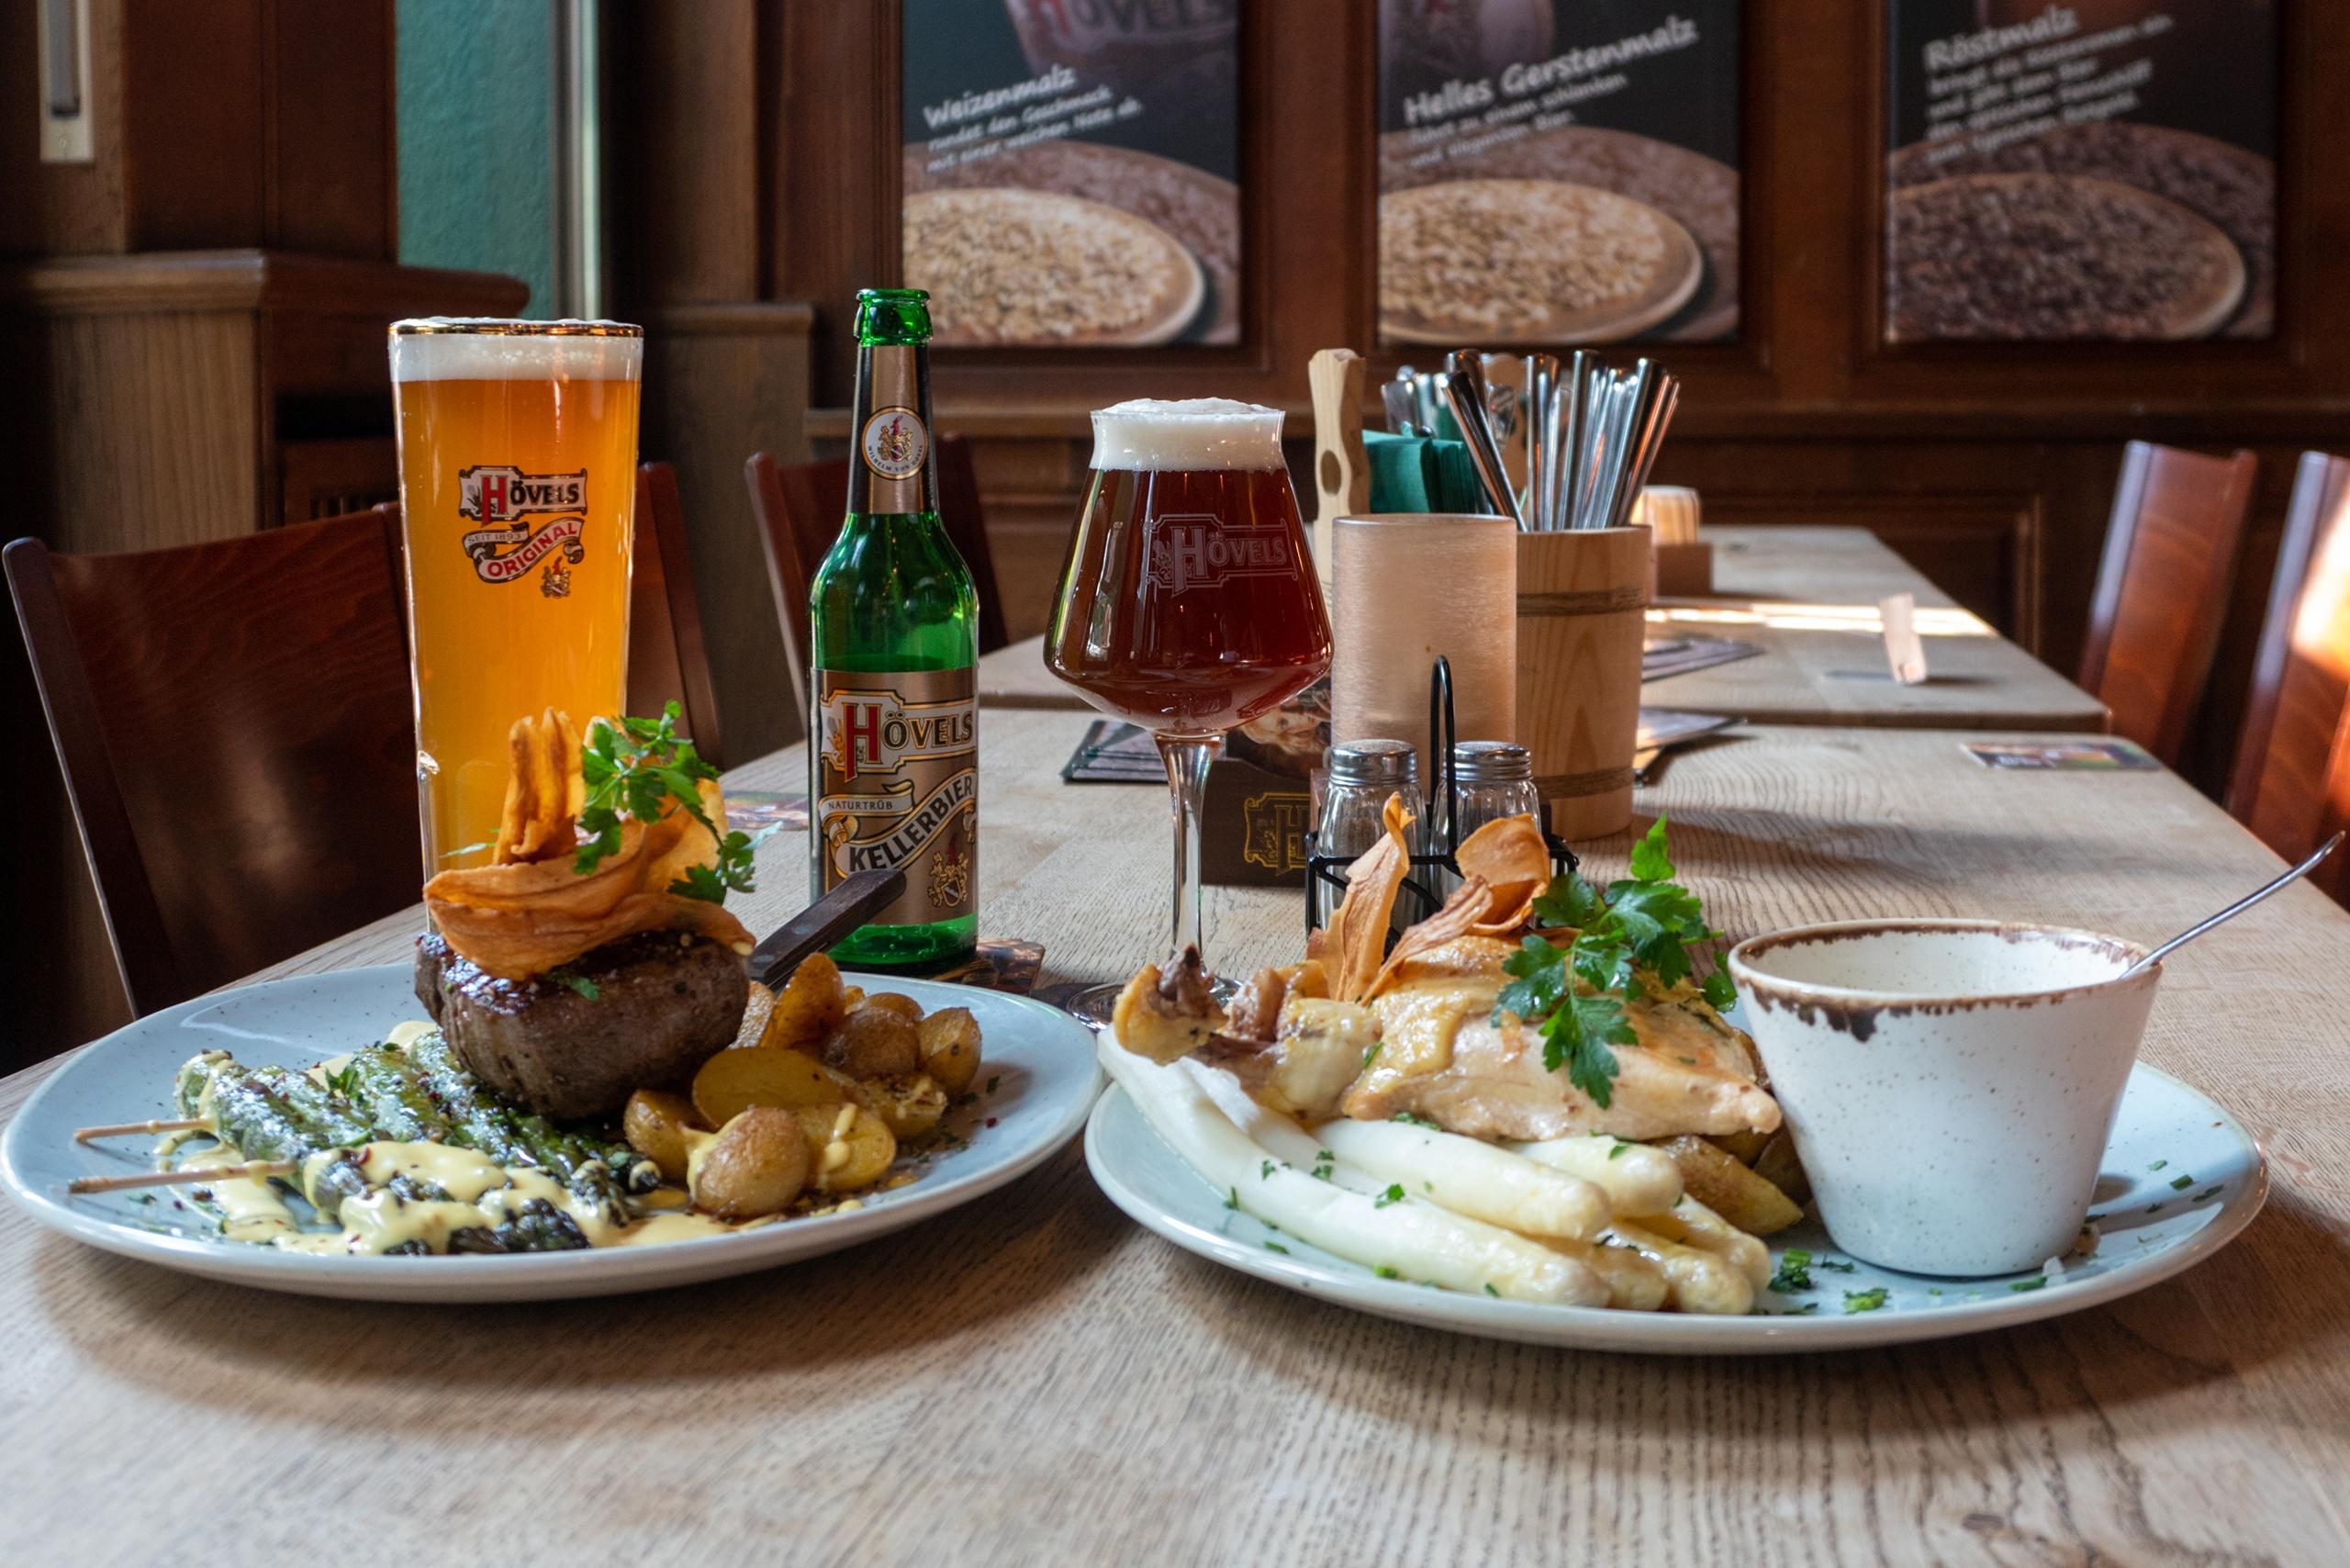 Hövels Hausbrauerei Restaurant Dortmund City (Speisen & traditionelles Bier)